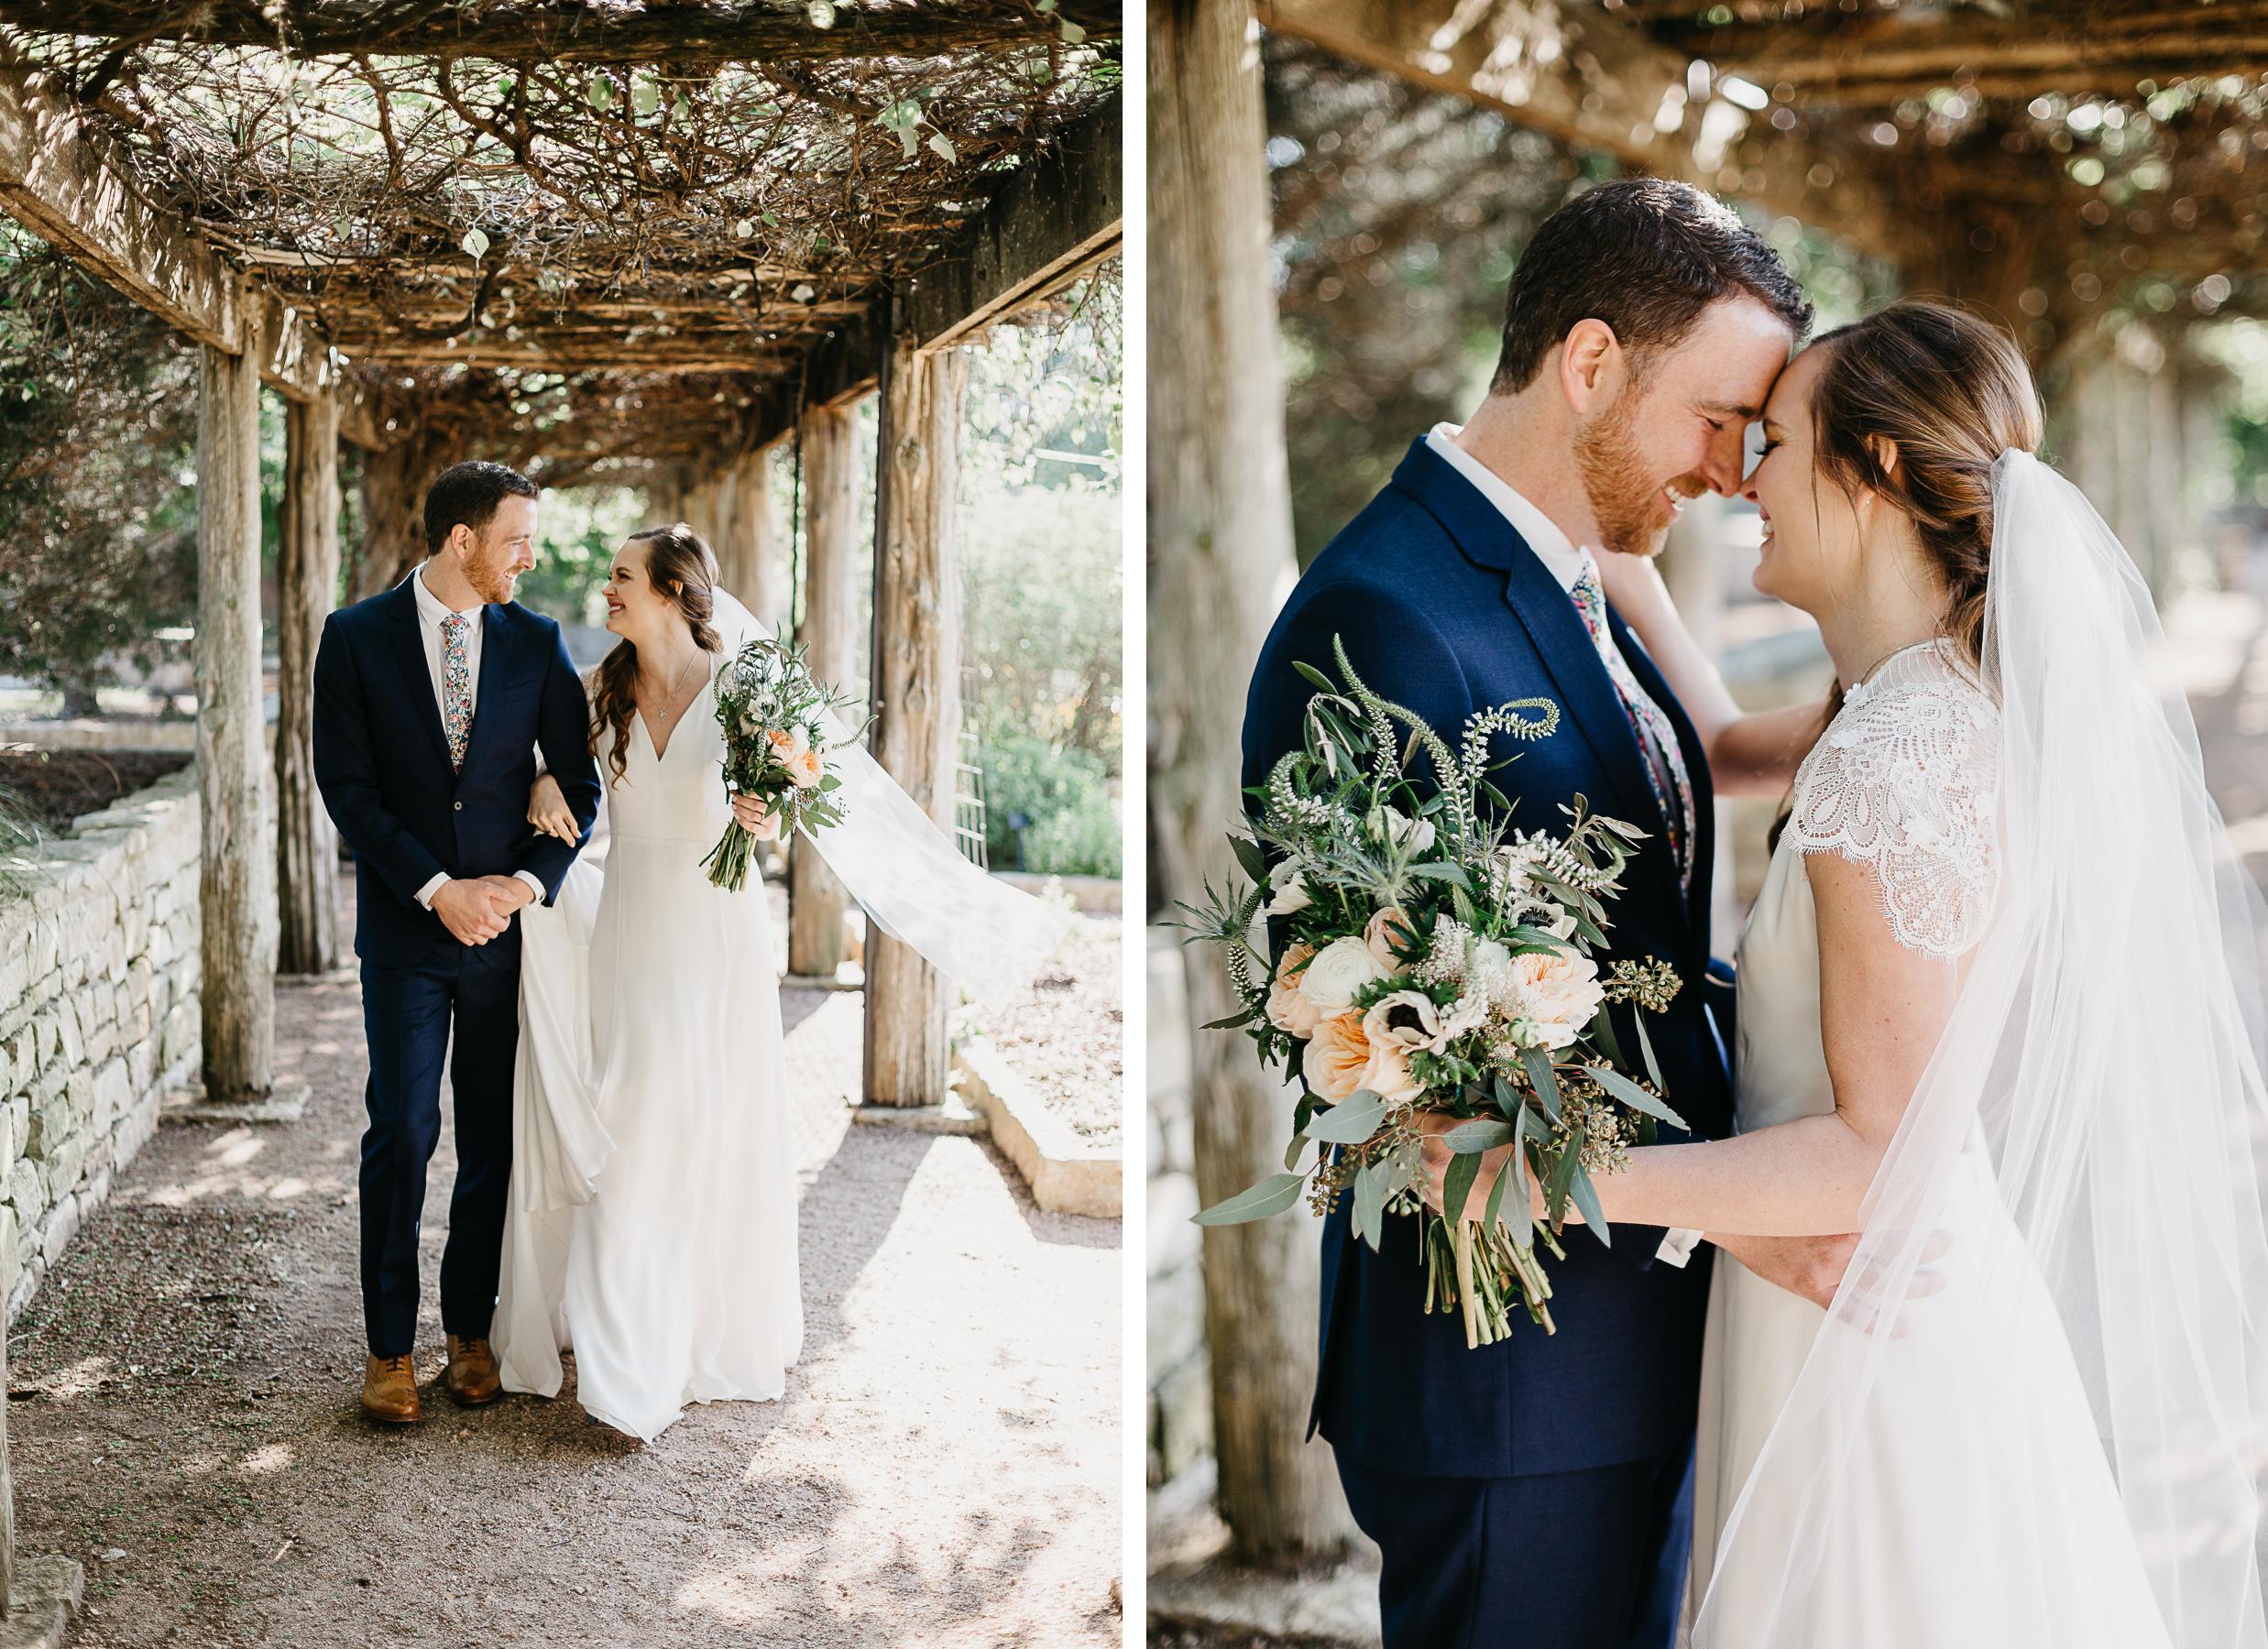 Austin Wedding Photographer Lady Bird Johnson Wildflower Center Wedding 6.jpg